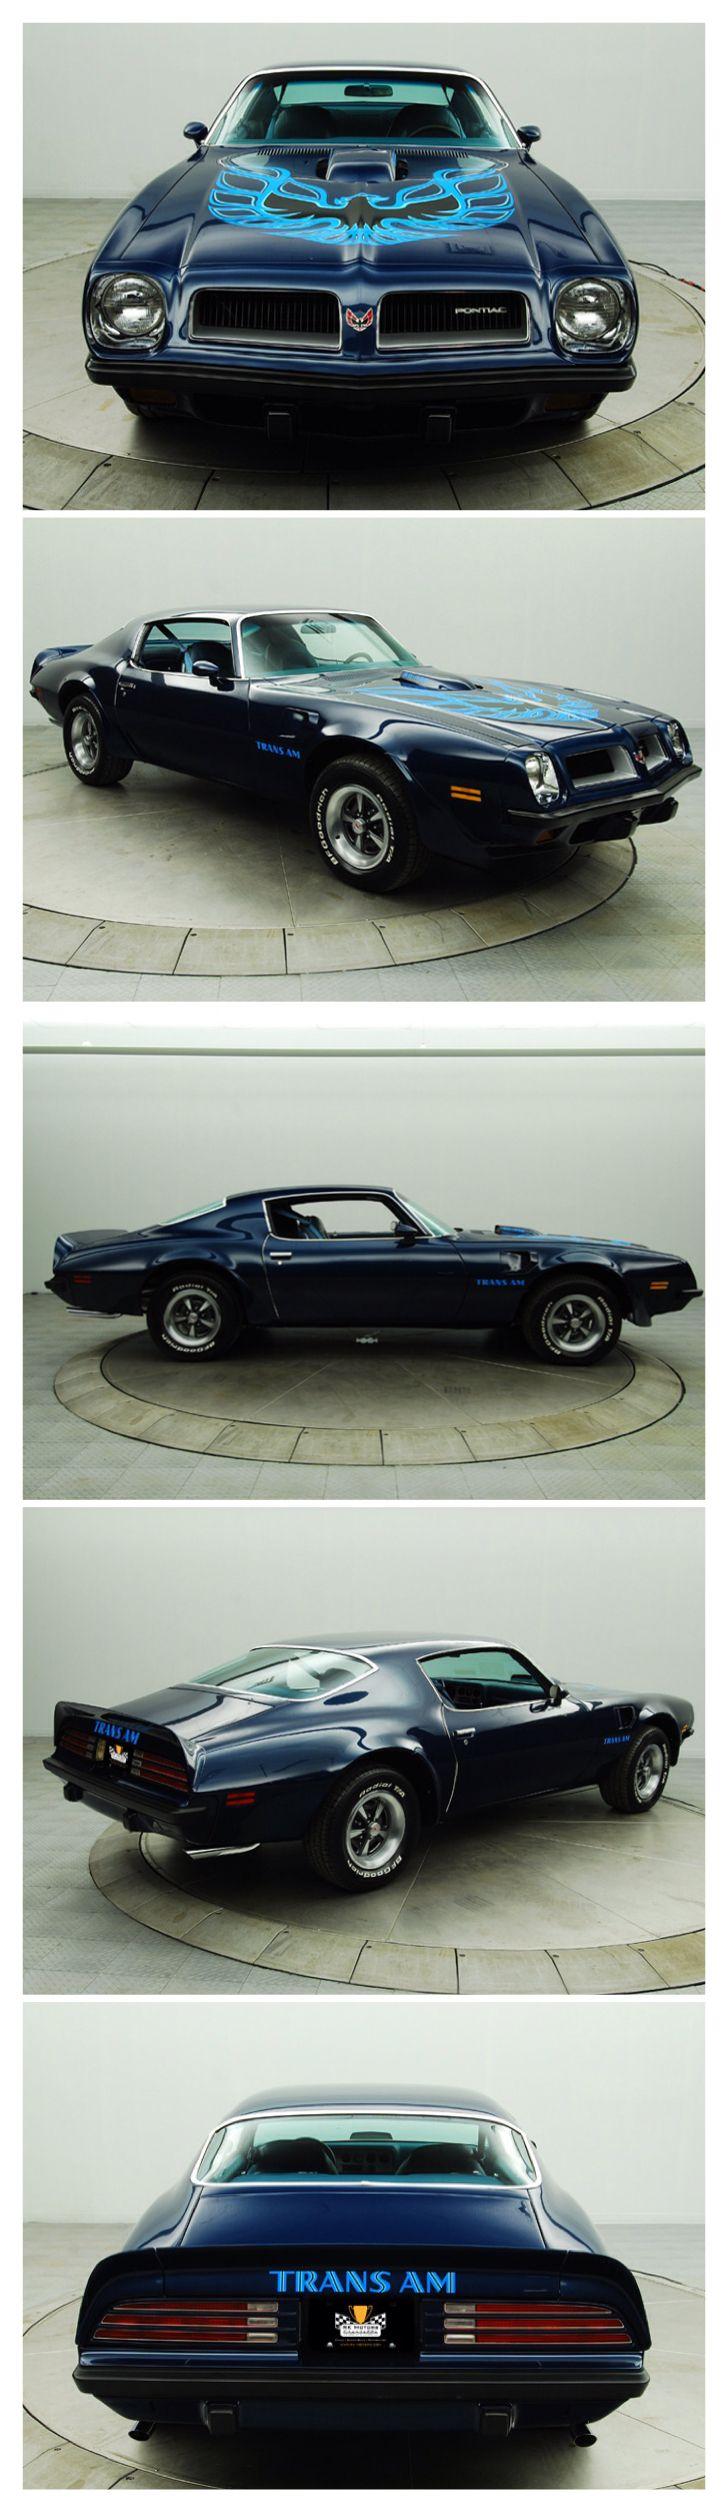 1974 Pontiac Trans Am-Super Duty